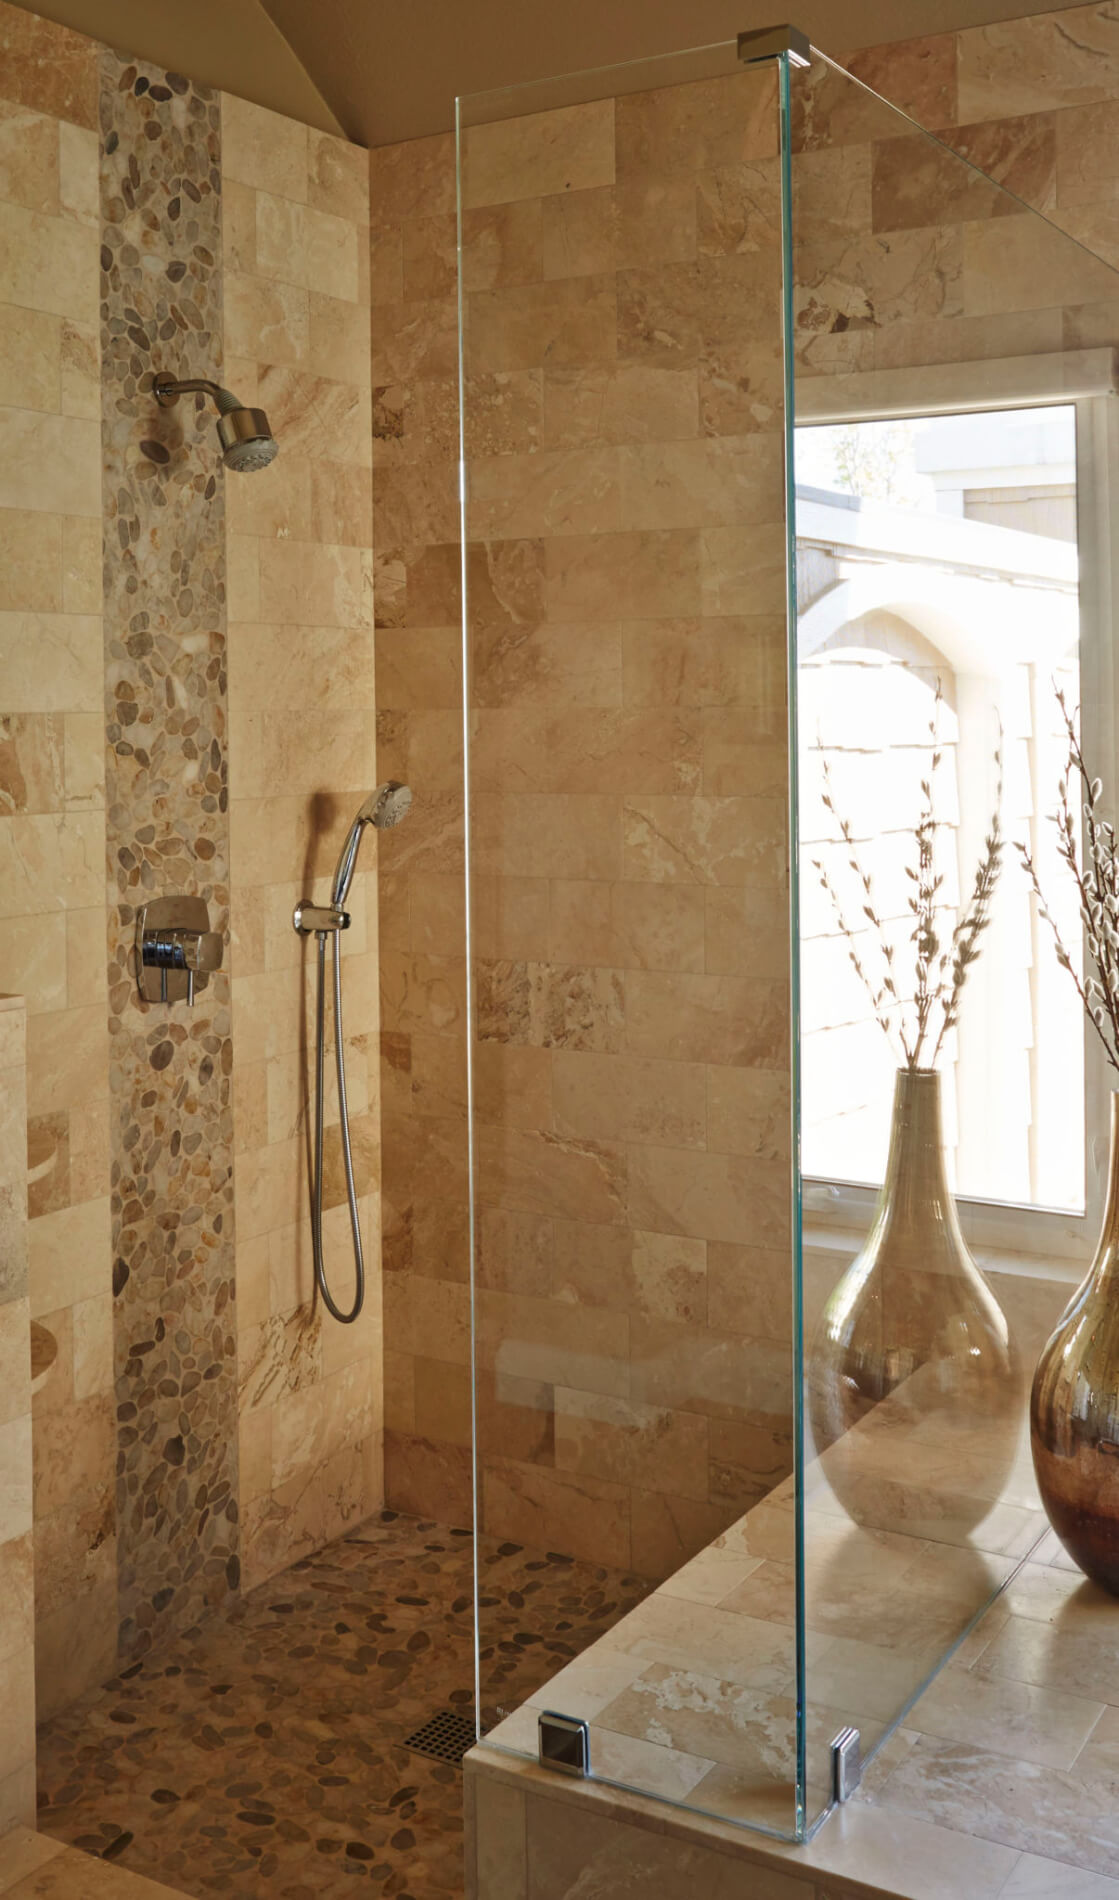 Large Shower, Shower Remodeling Companies, Bathroom Remodeling Companies